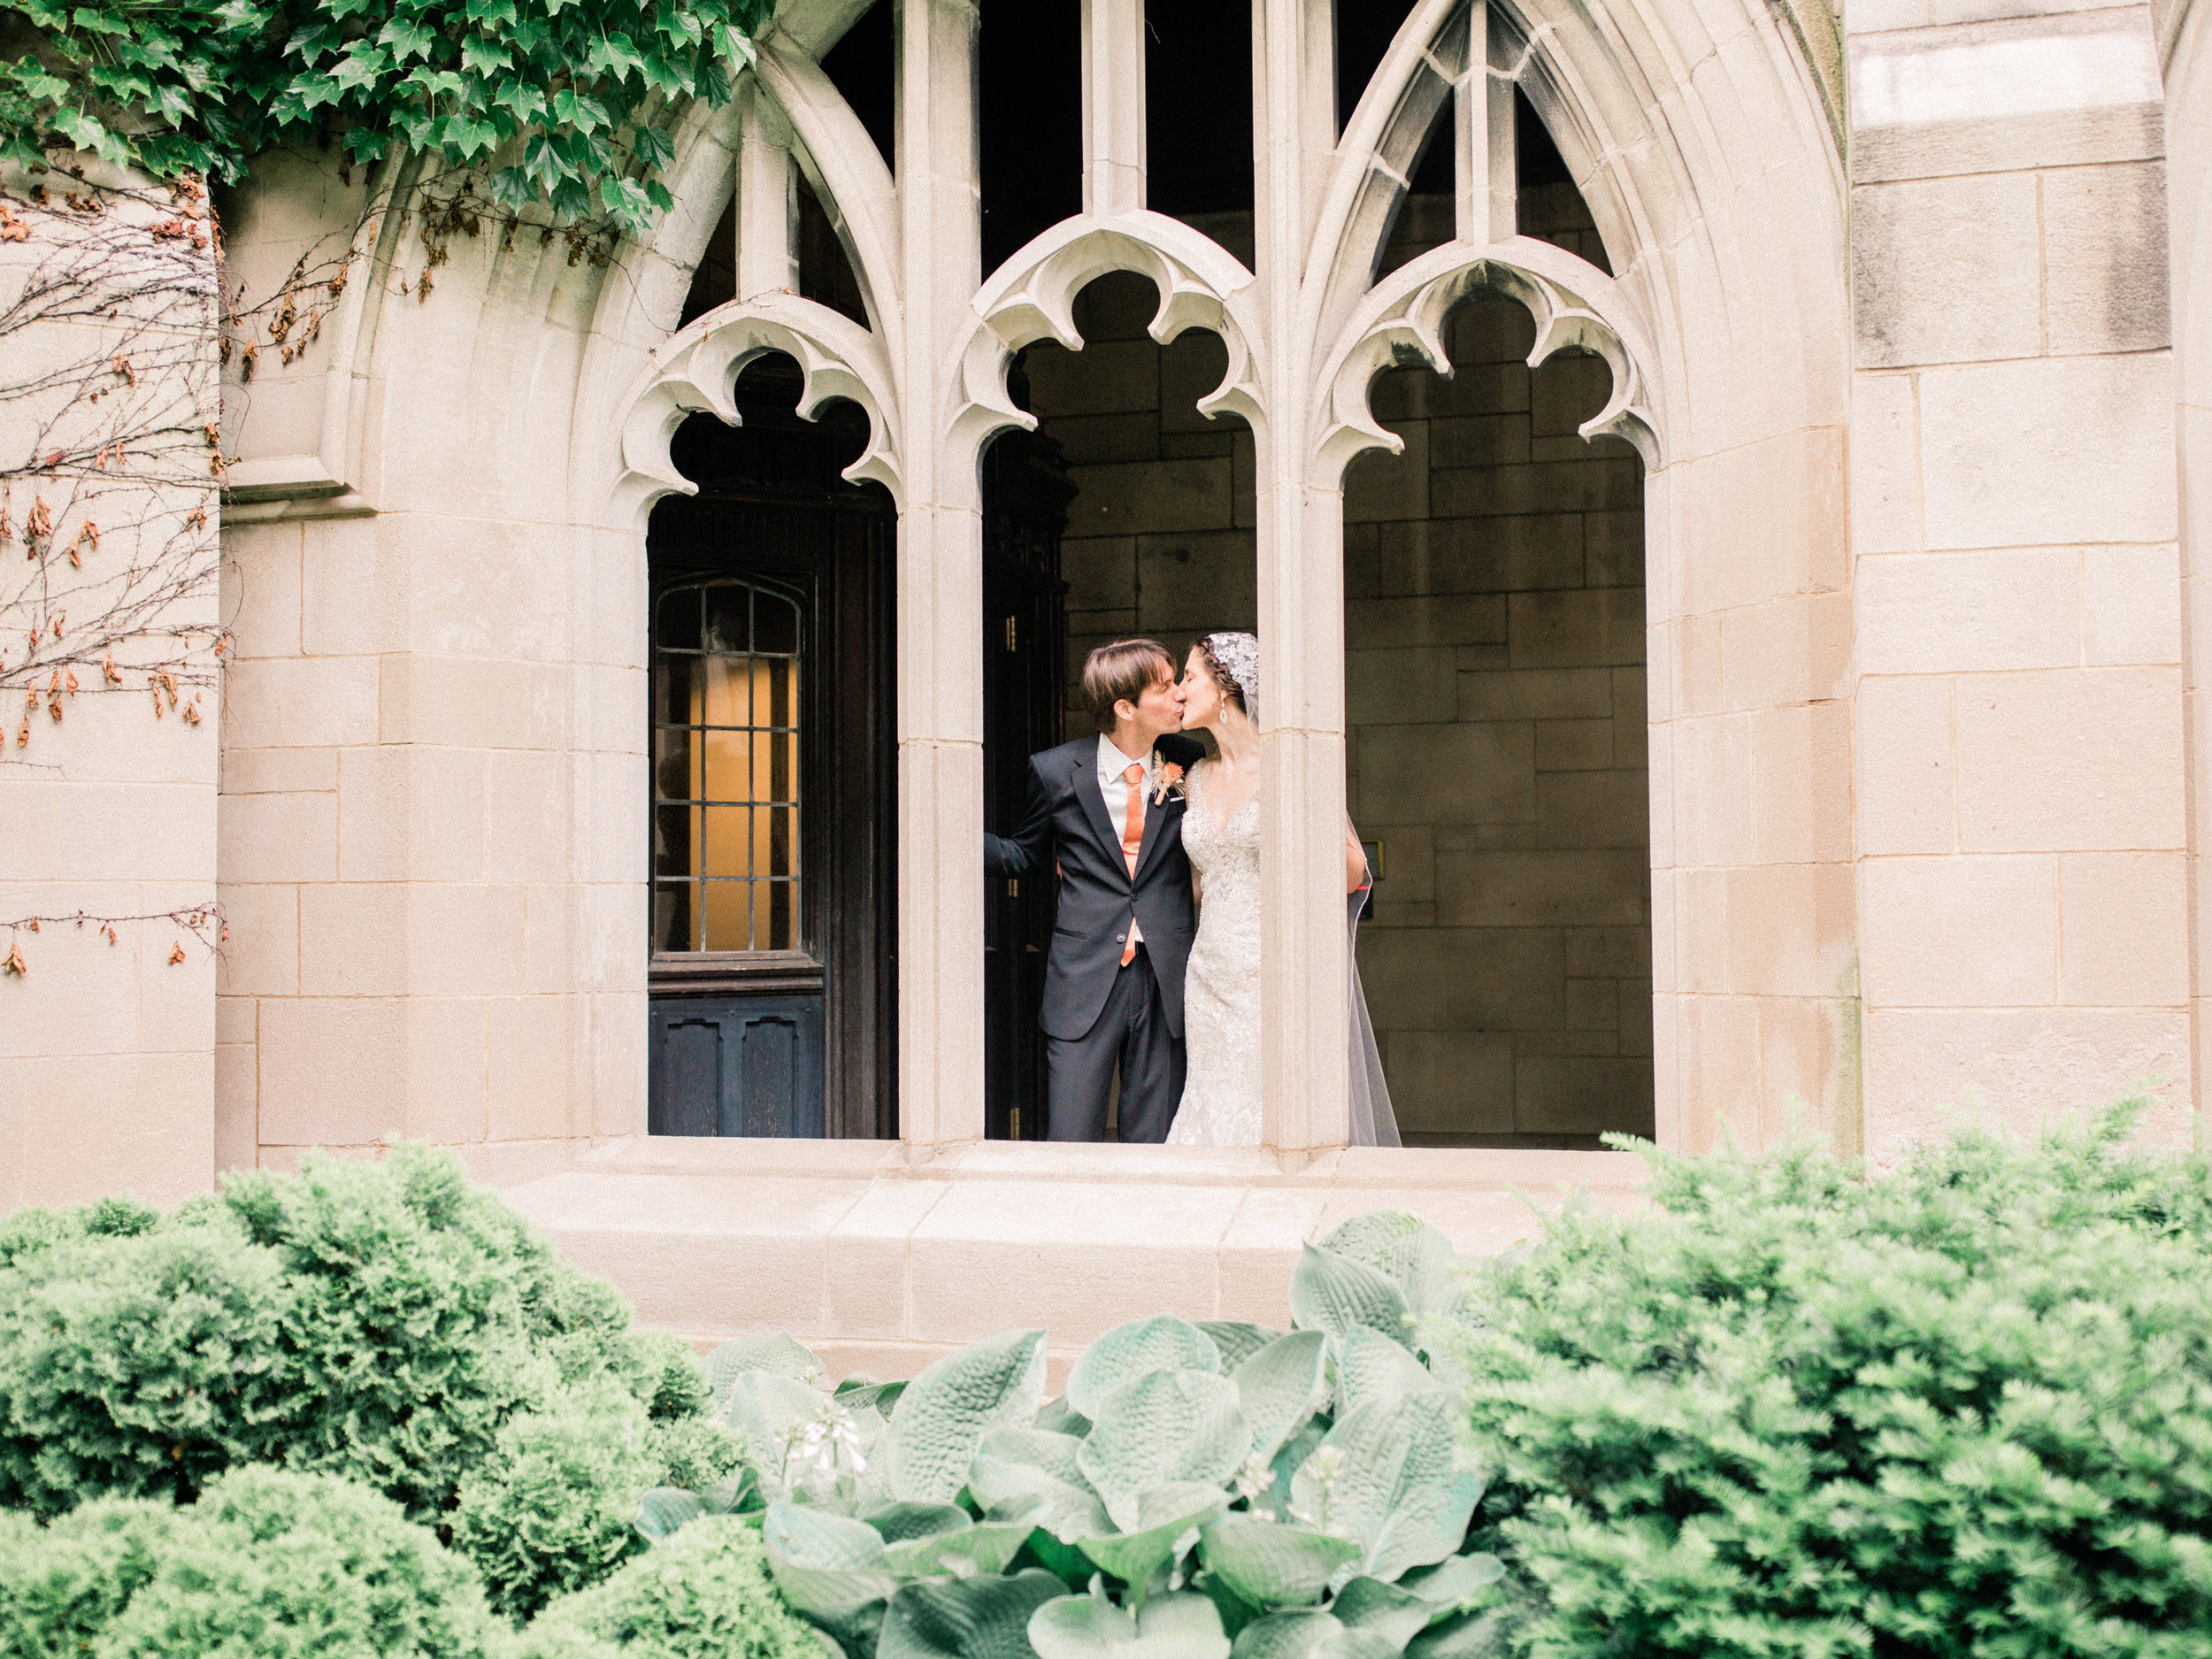 Dorothy_Louise_Photography_University_of_Chicago_Chapel_Wedding-85.jpg